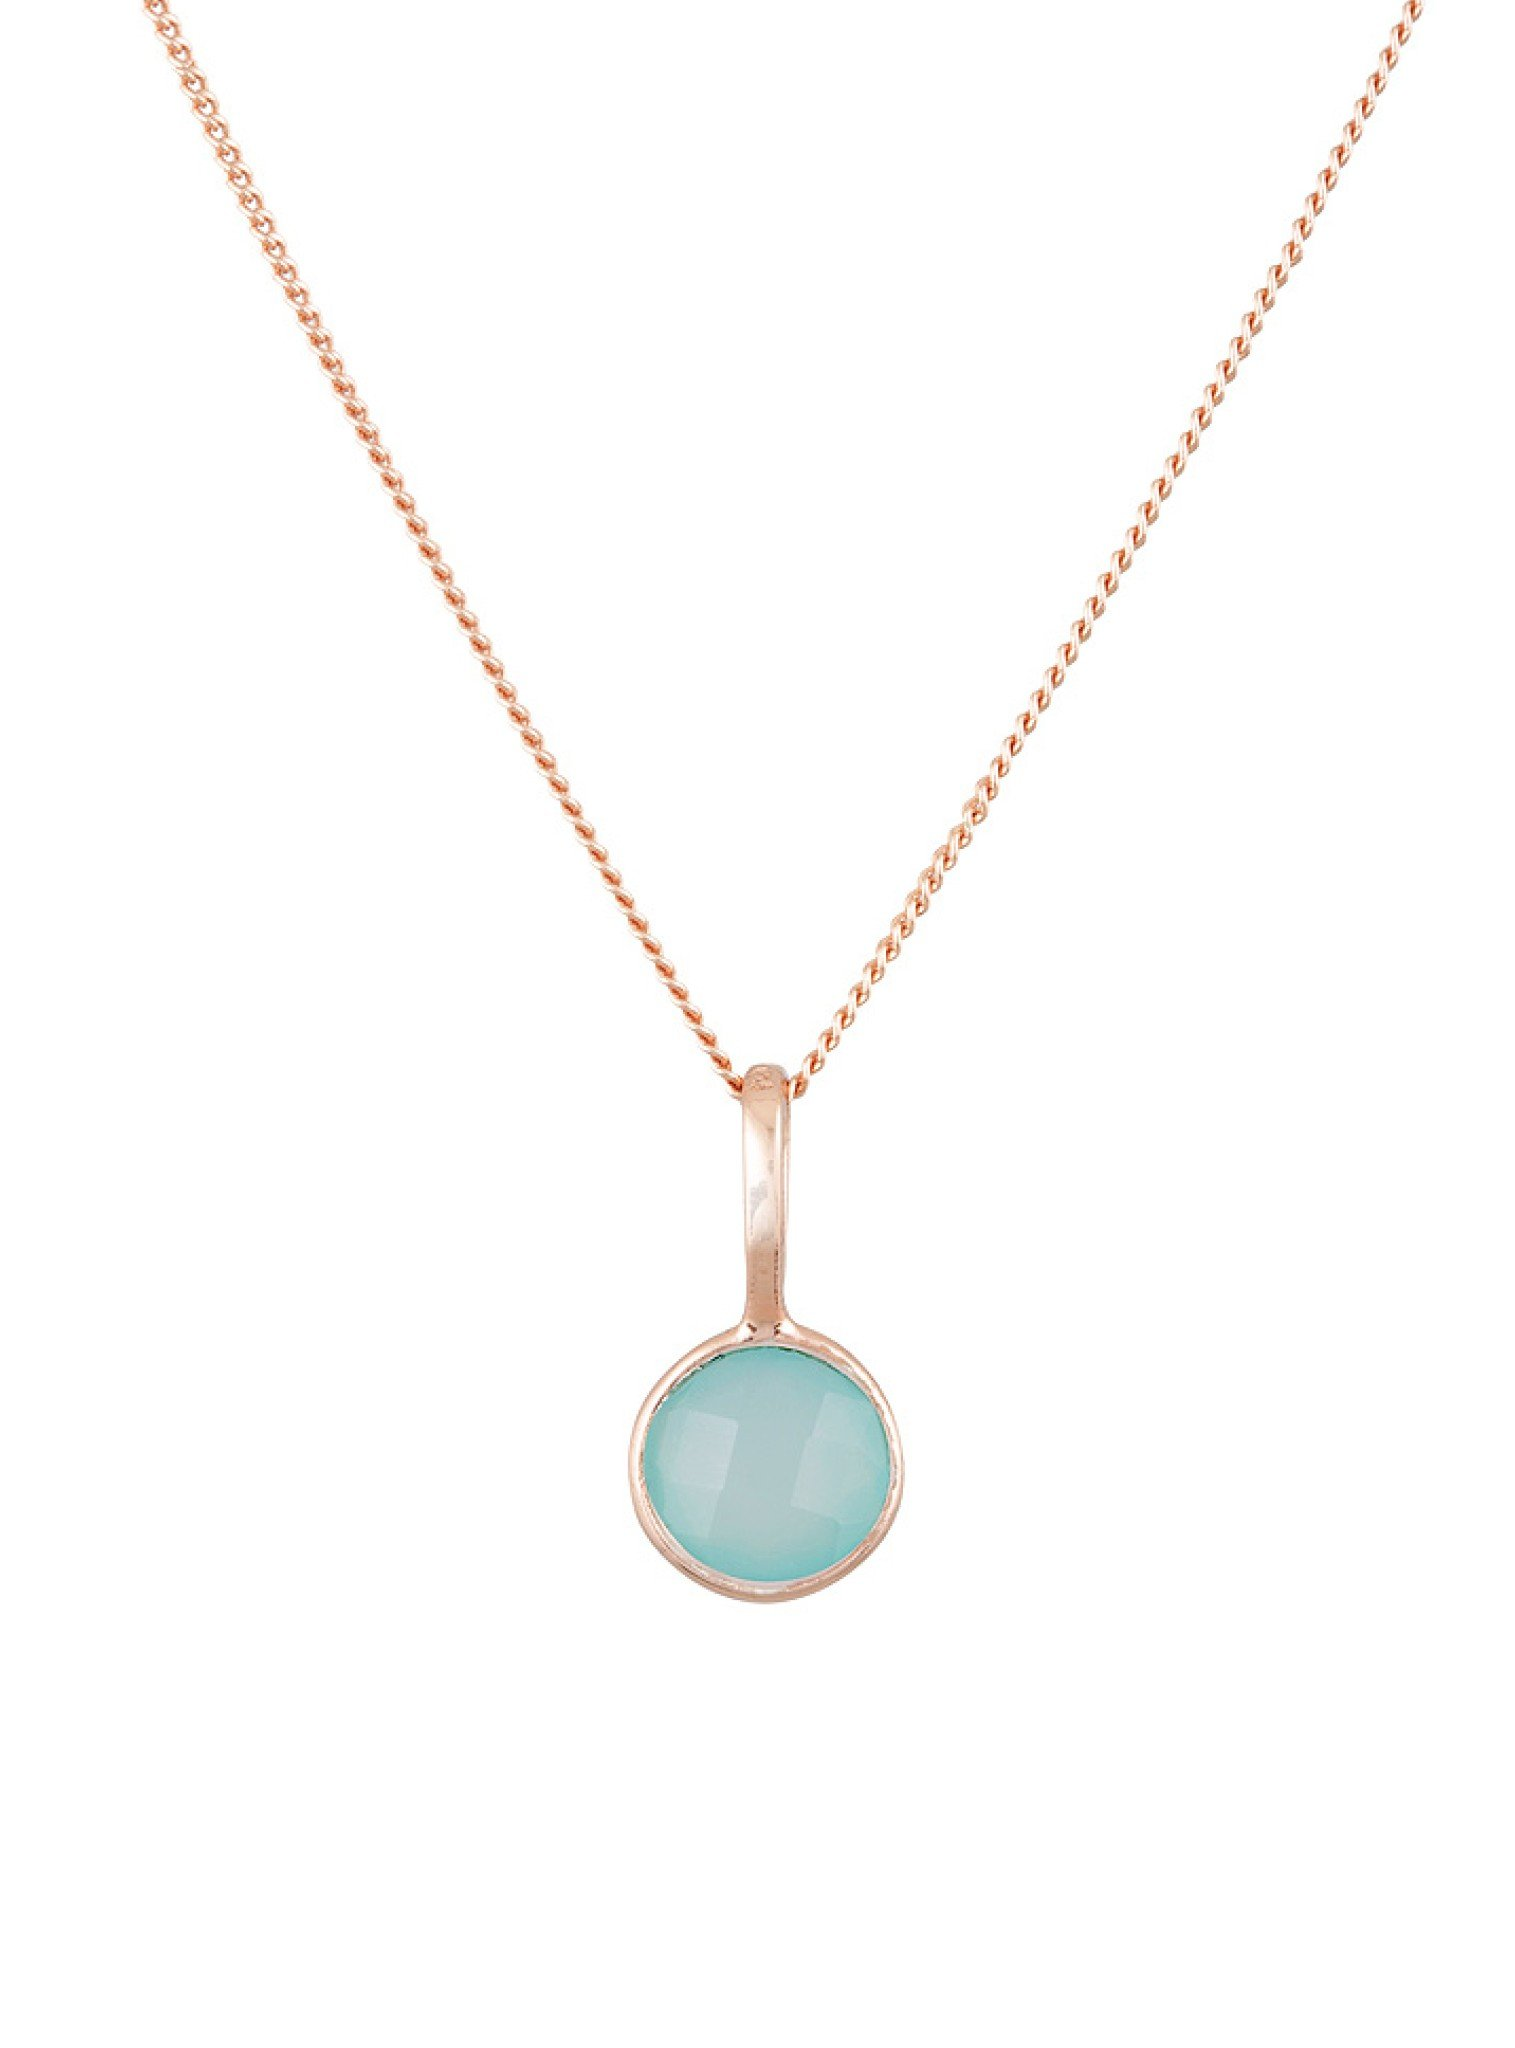 Selene Single Pendant Aqua Chalcedony Necklace in Rose Gold